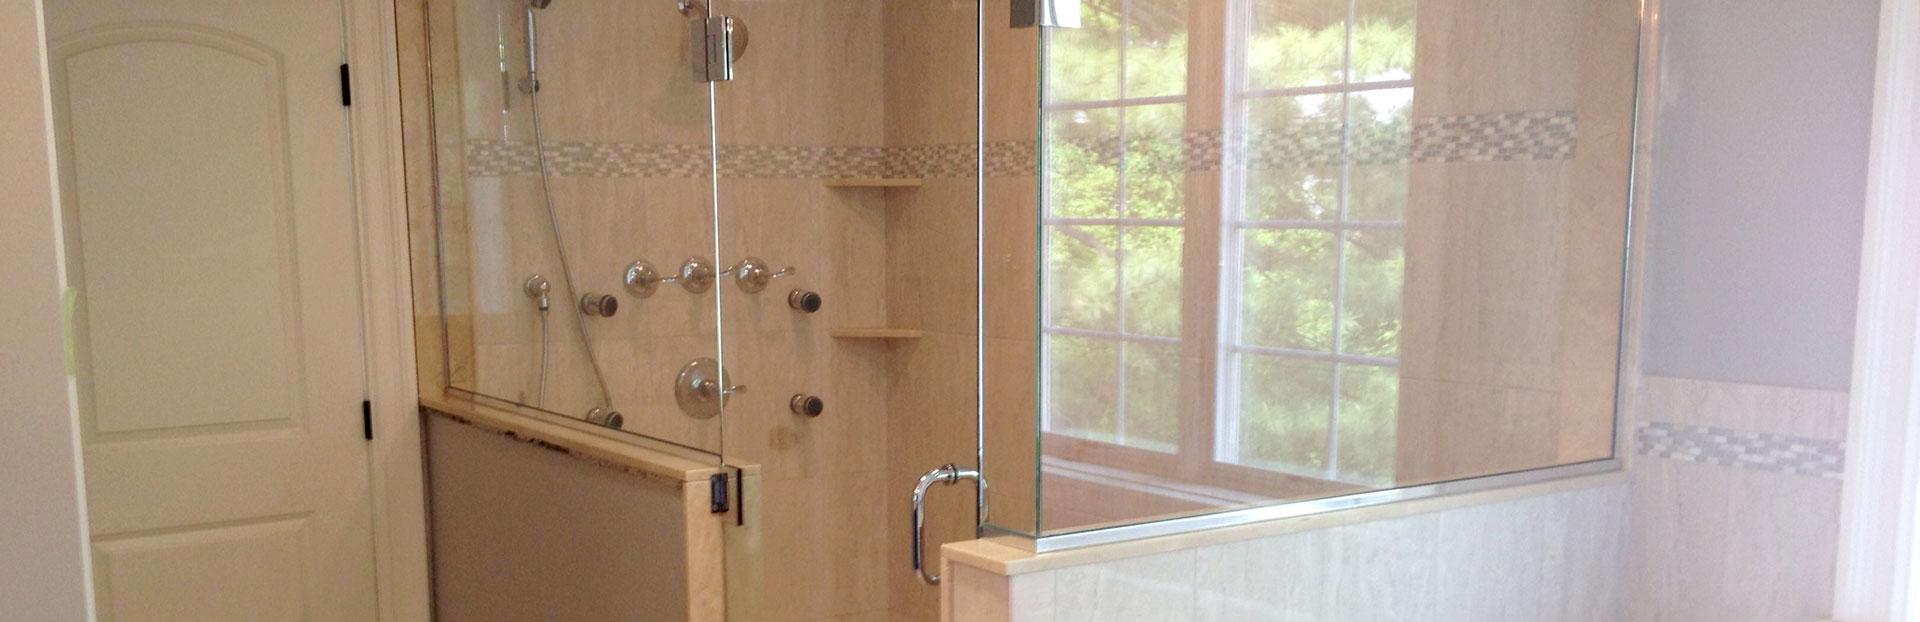 Corner steam shower - Franklin Glass Company